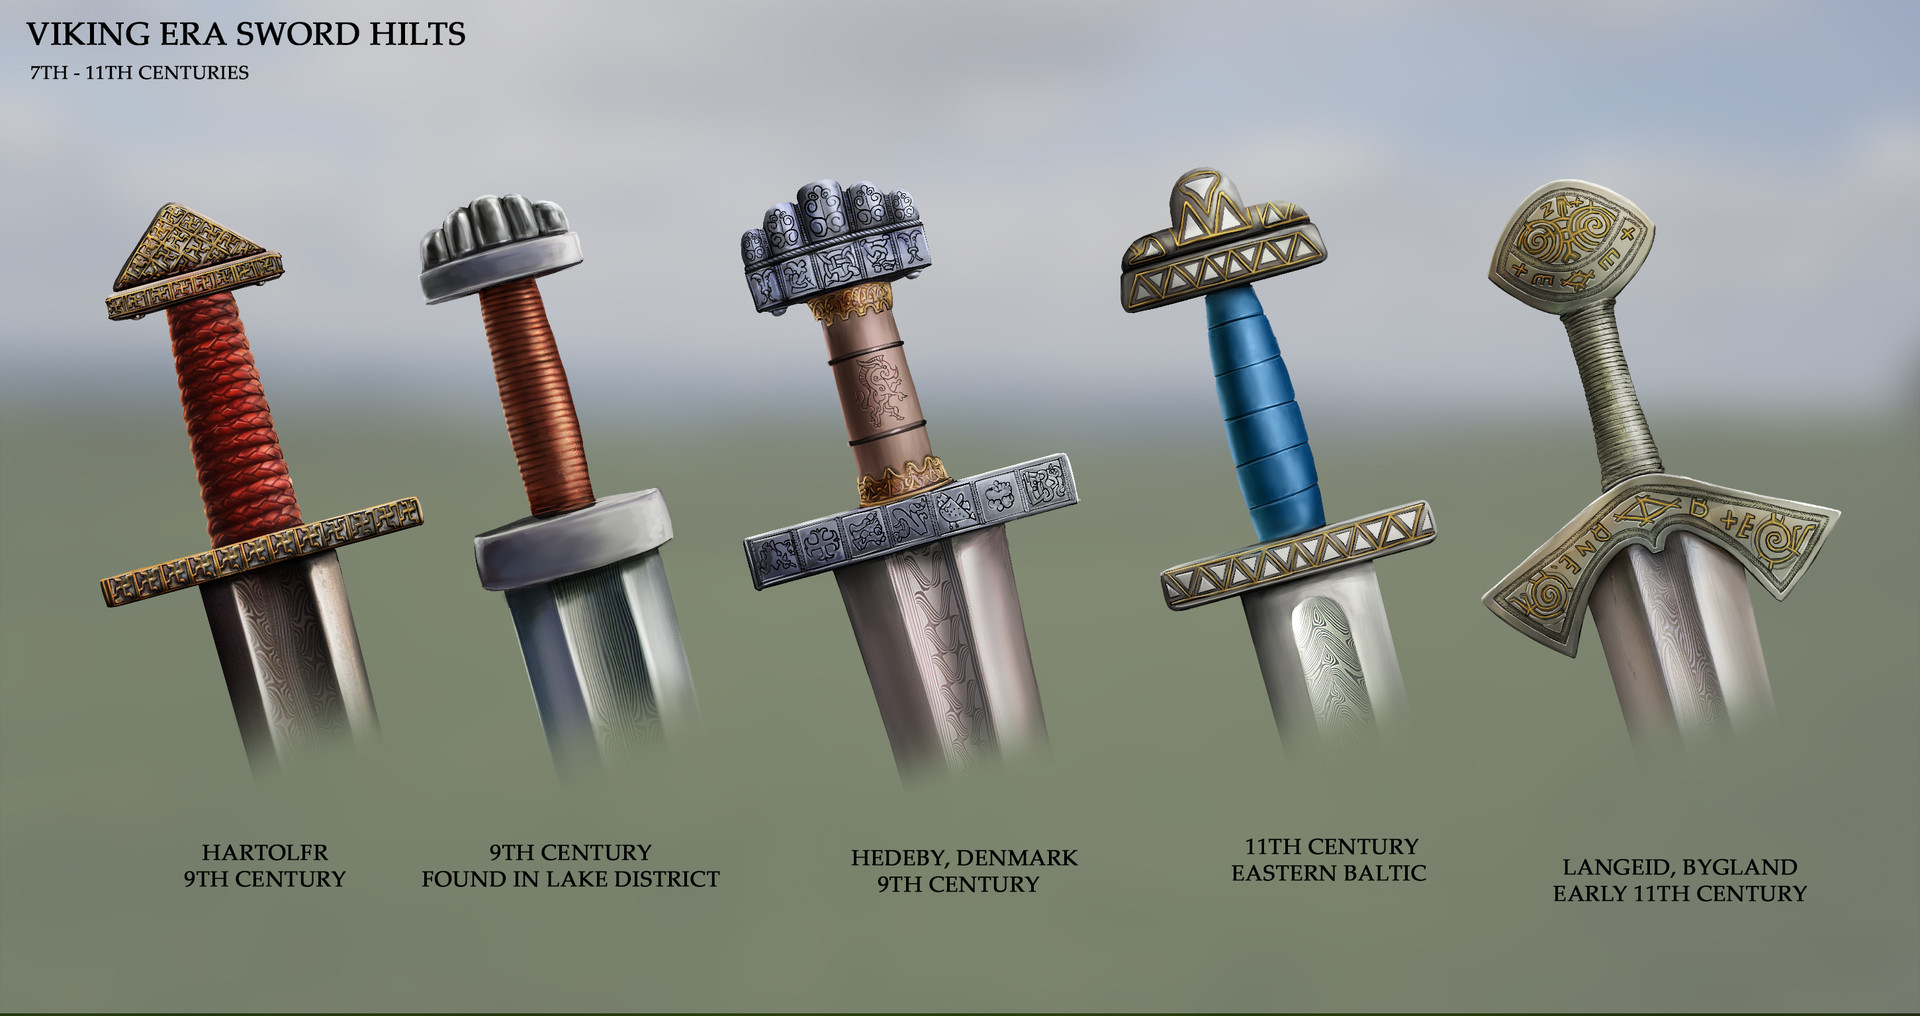 Viking Era Sword Hilts